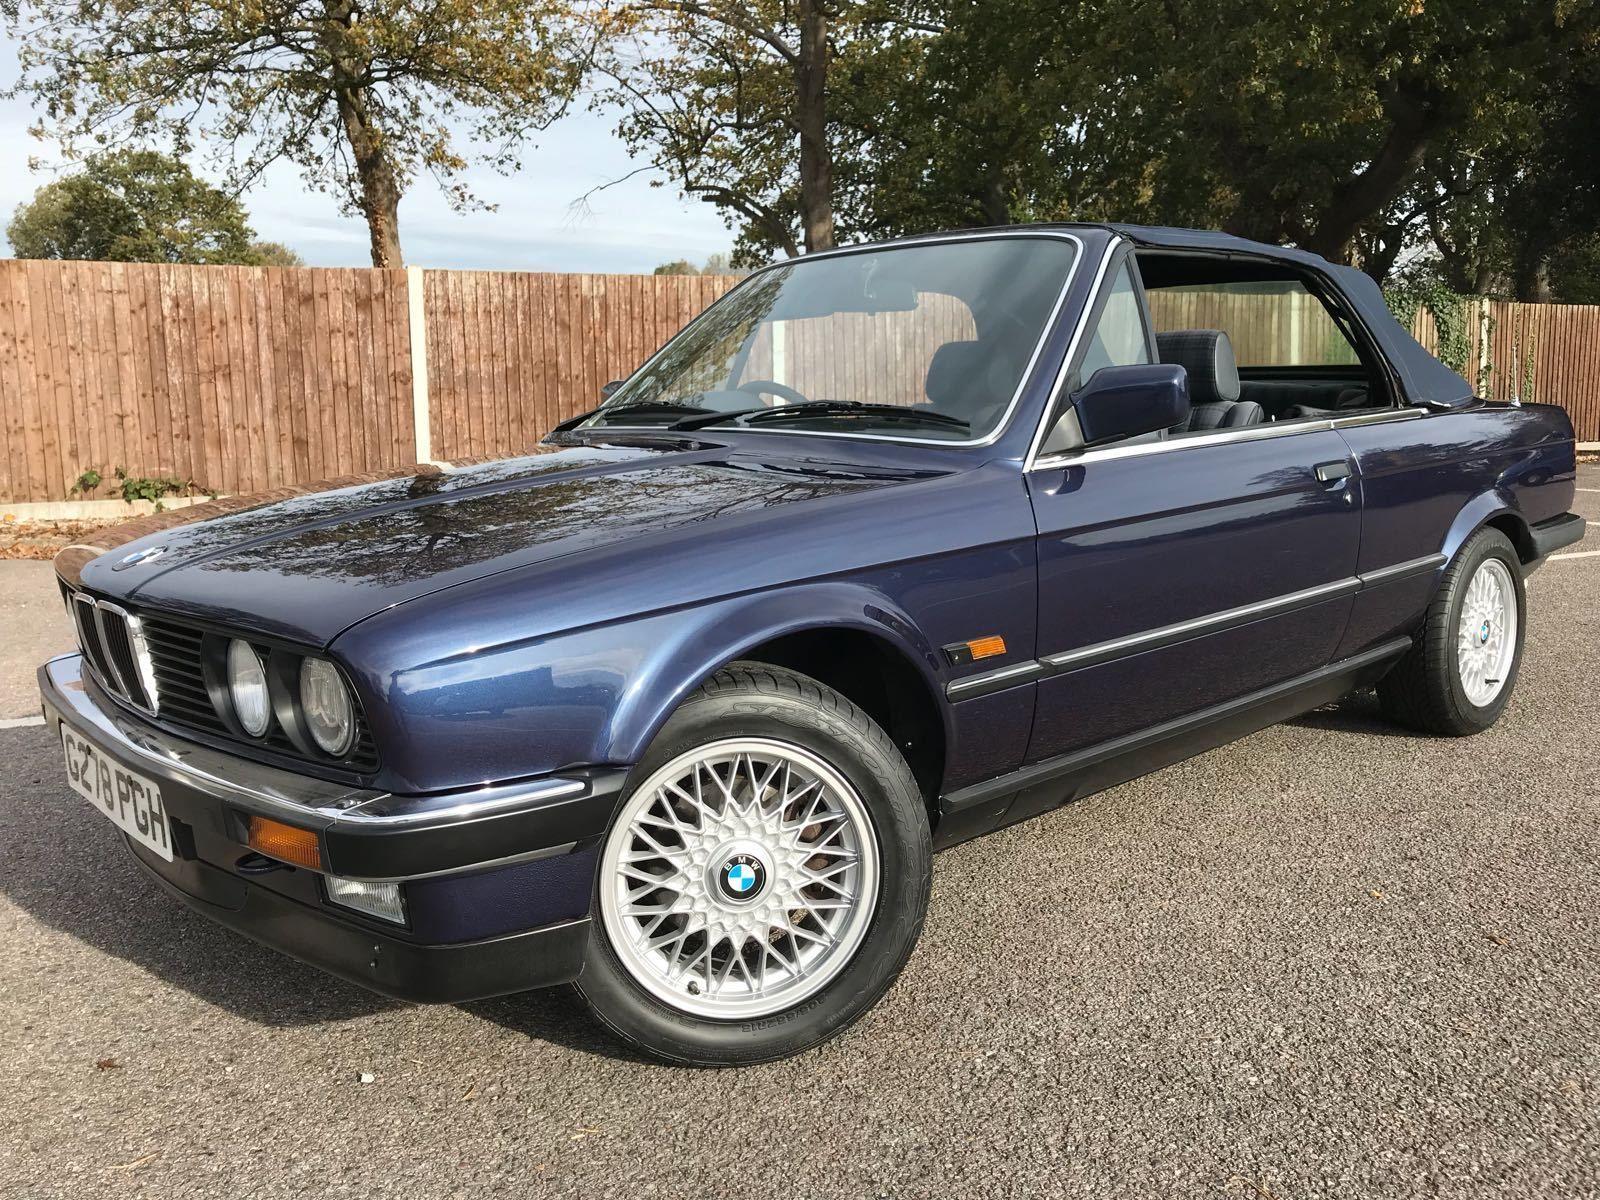 BMW E30 320i cabriolet 325i Manual Royal Metalic Blue convertible 93k:  £0.99 (0 Bids) End Date: Wednesday Feb-28-2018 20:19:04 GMT Bid now…